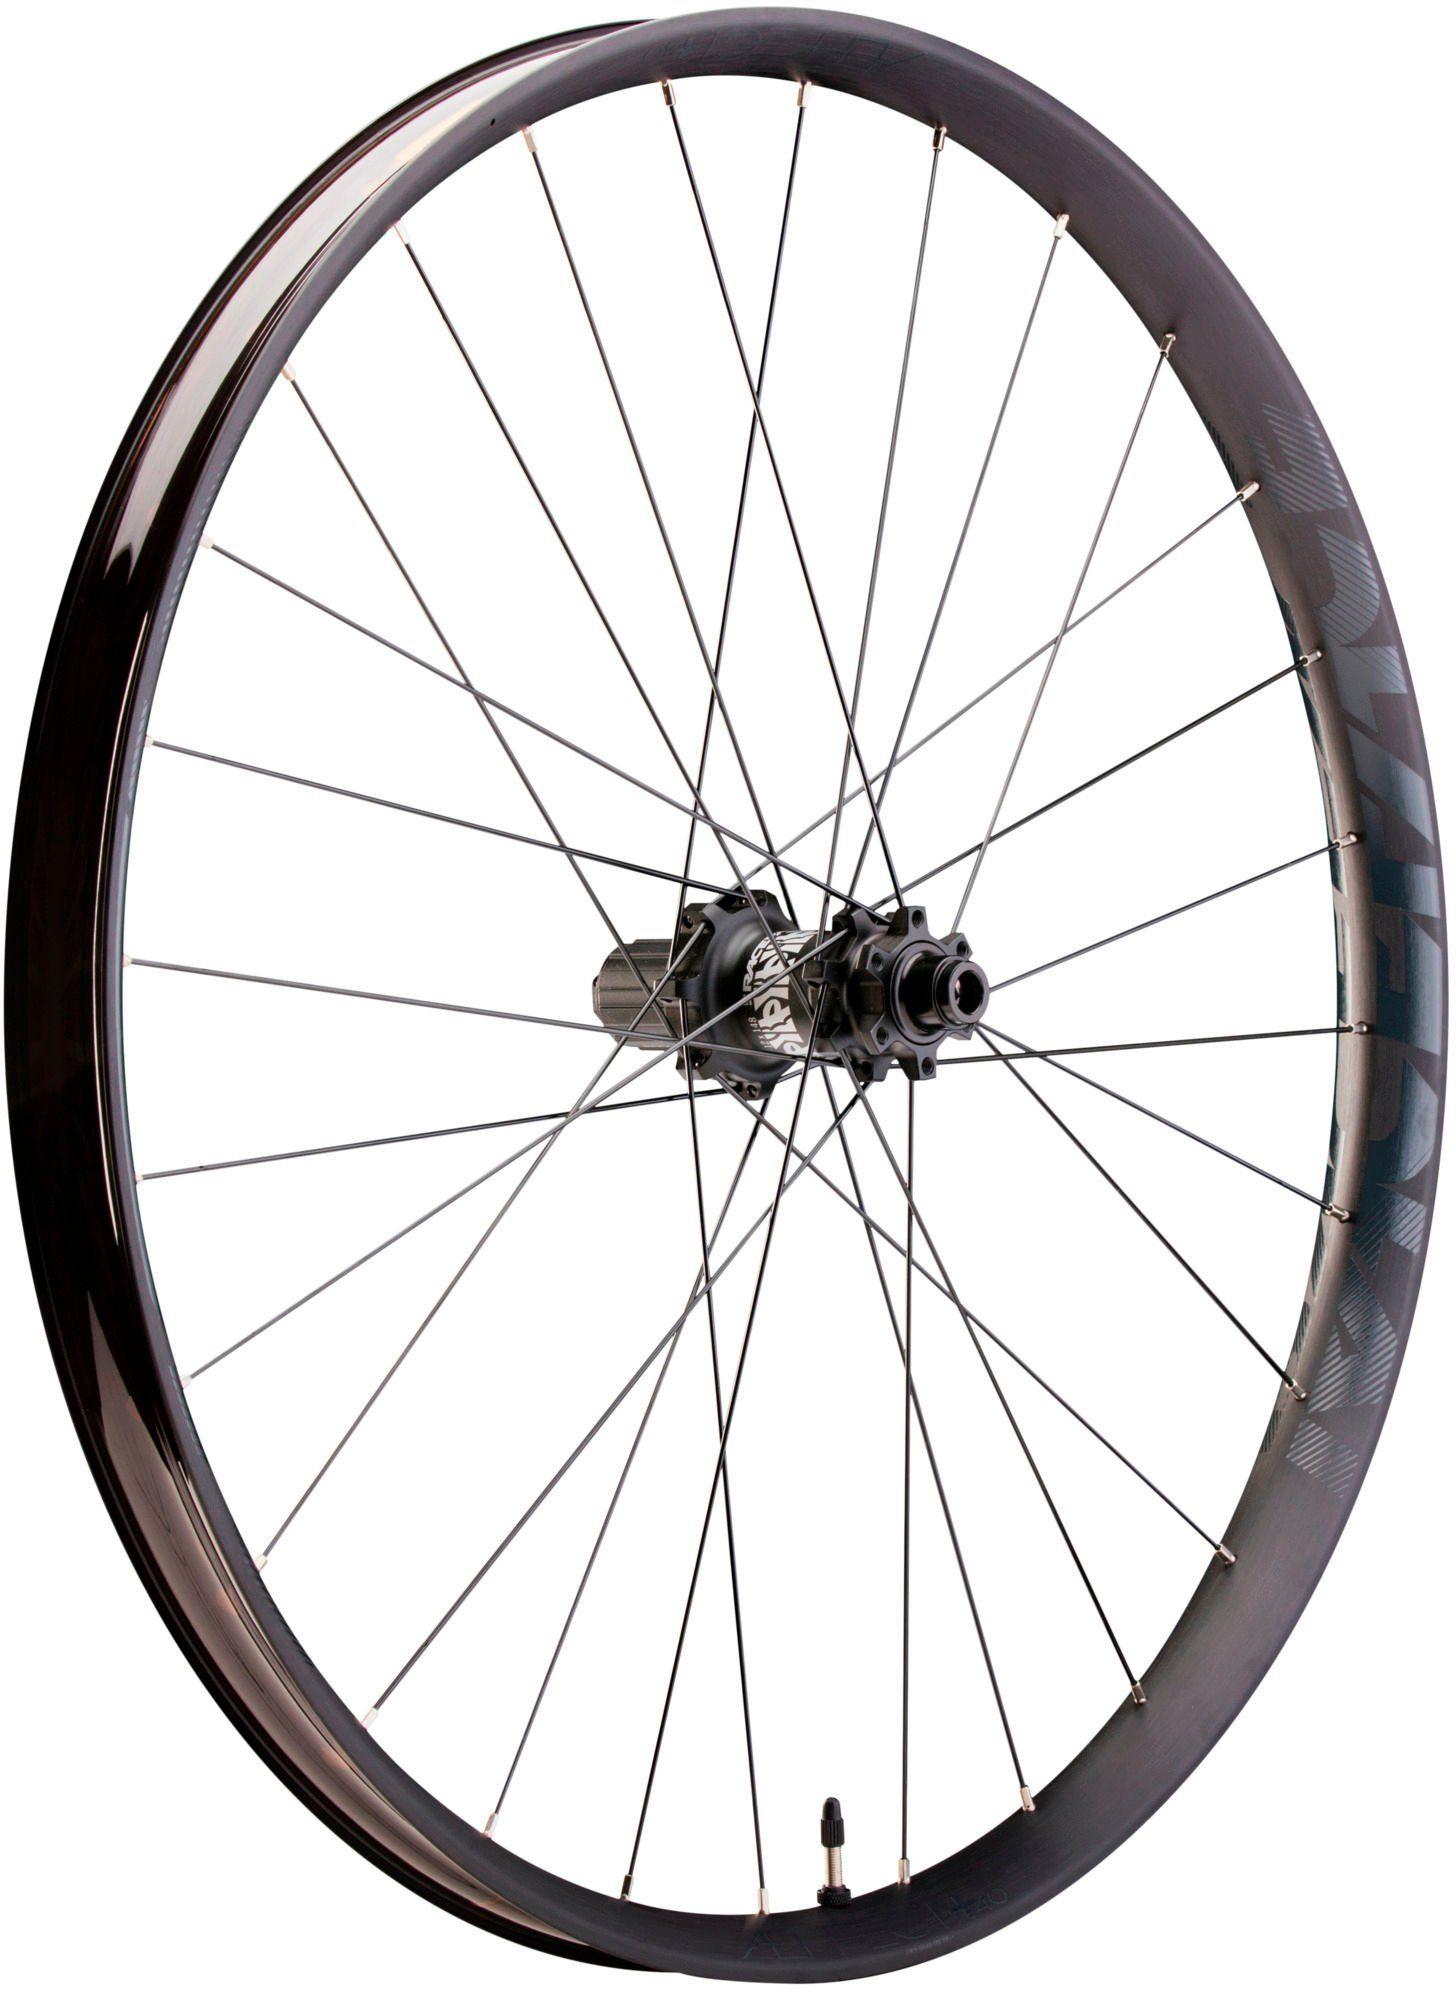 "Race Face Laufrad »Wheel Aeffect-Plus 40 Hinterrad 27,5"" Boost«"